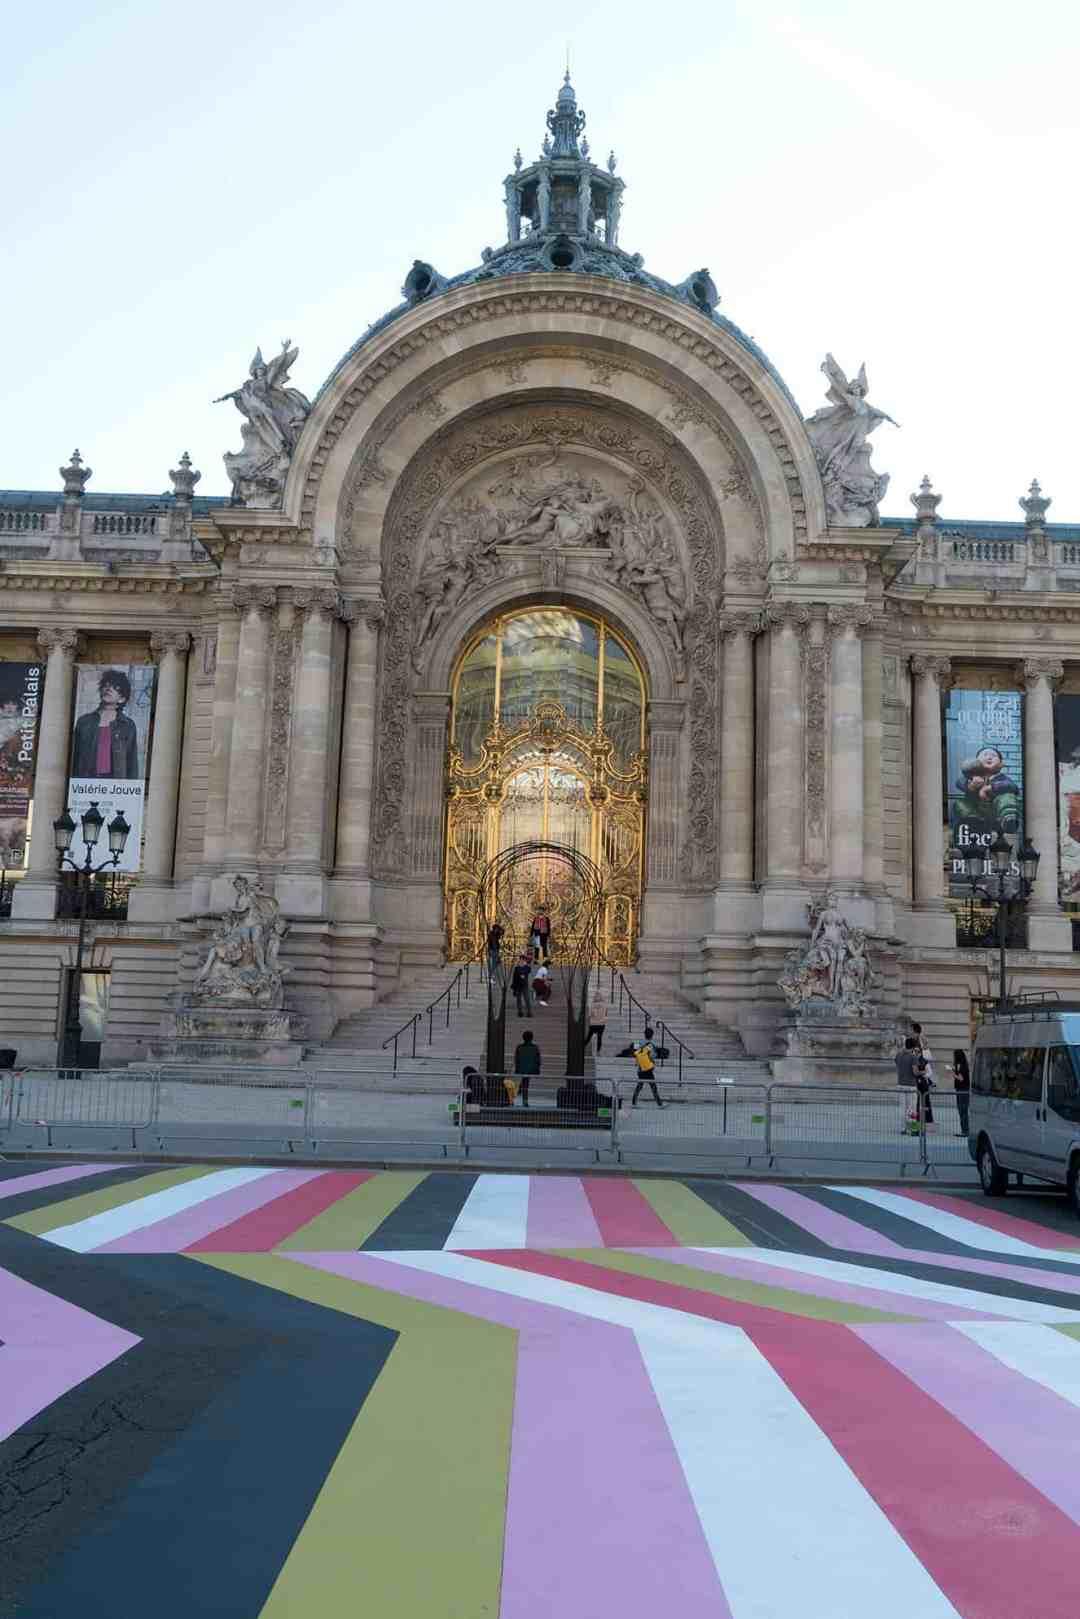 Street Painting #10, LANG & BAUMANN, 2018. Loevenbruck, Paris. © Marc Domage